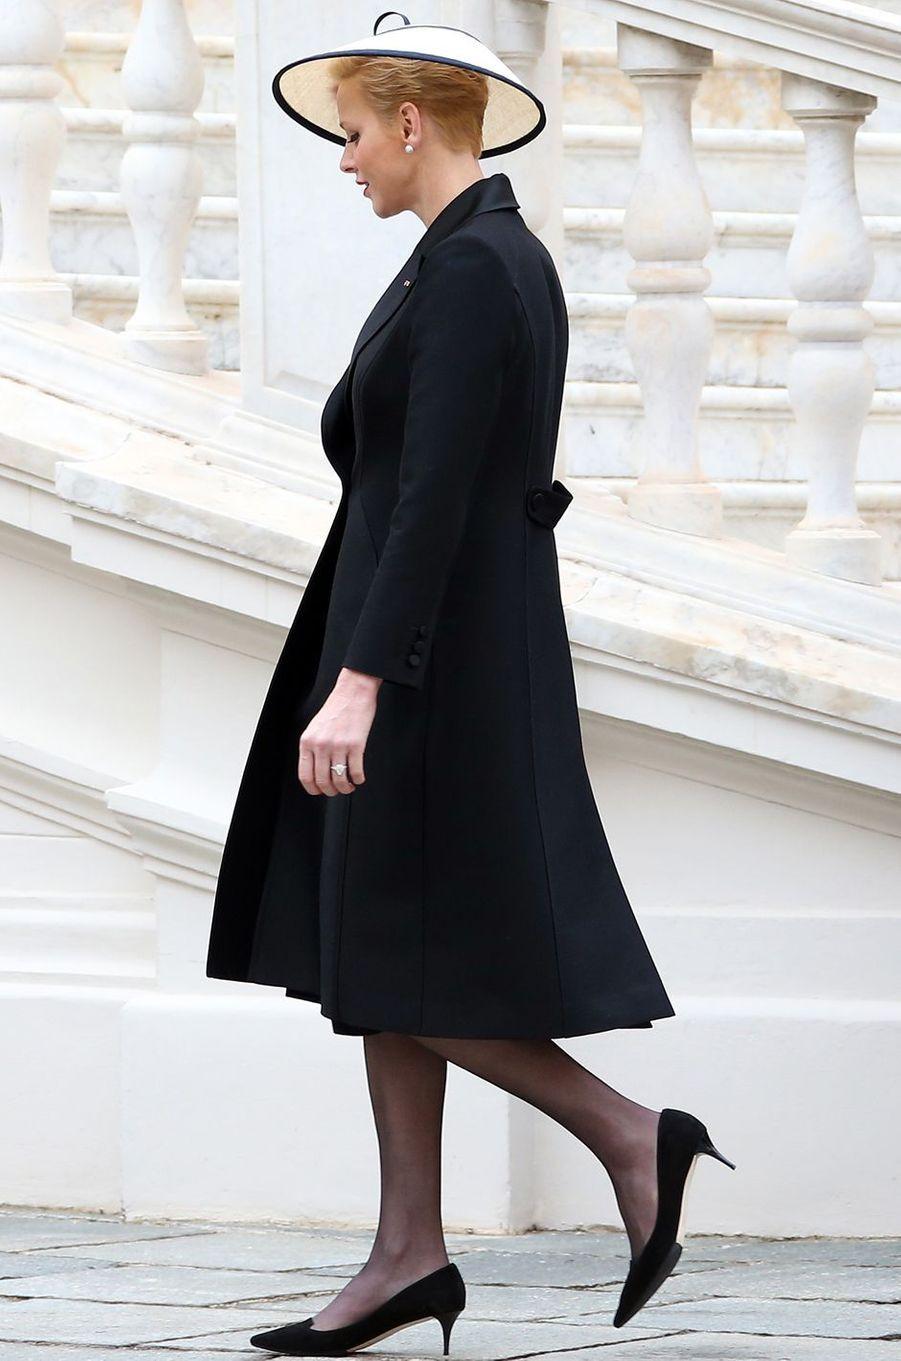 La princesse Charlène de Monaco à Monaco le 19 novembre 2016